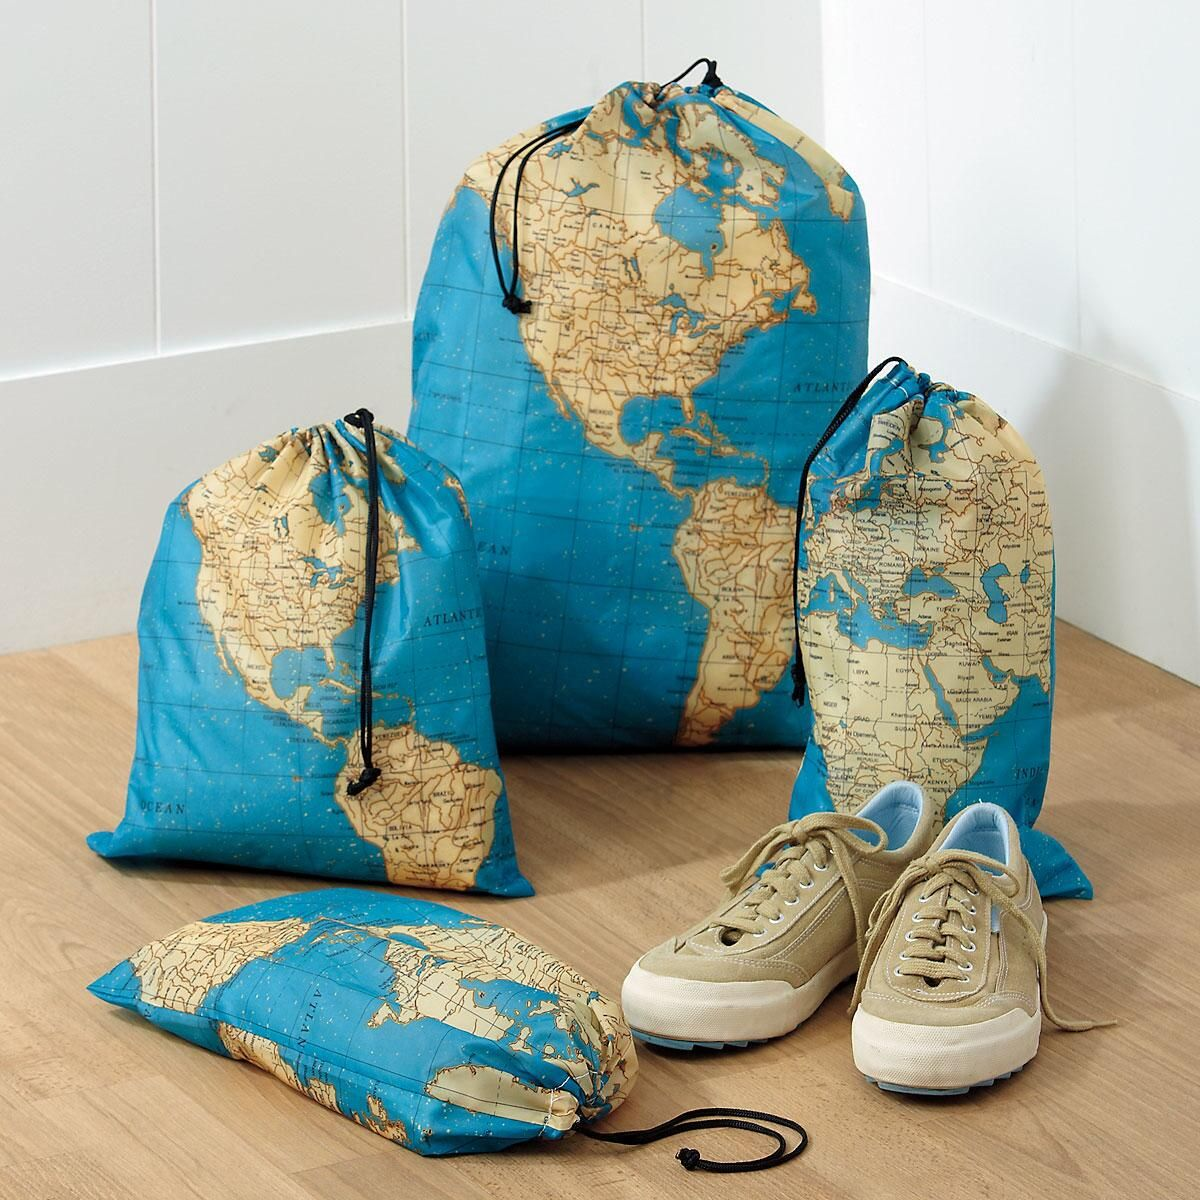 Around the World Travel Bag Set